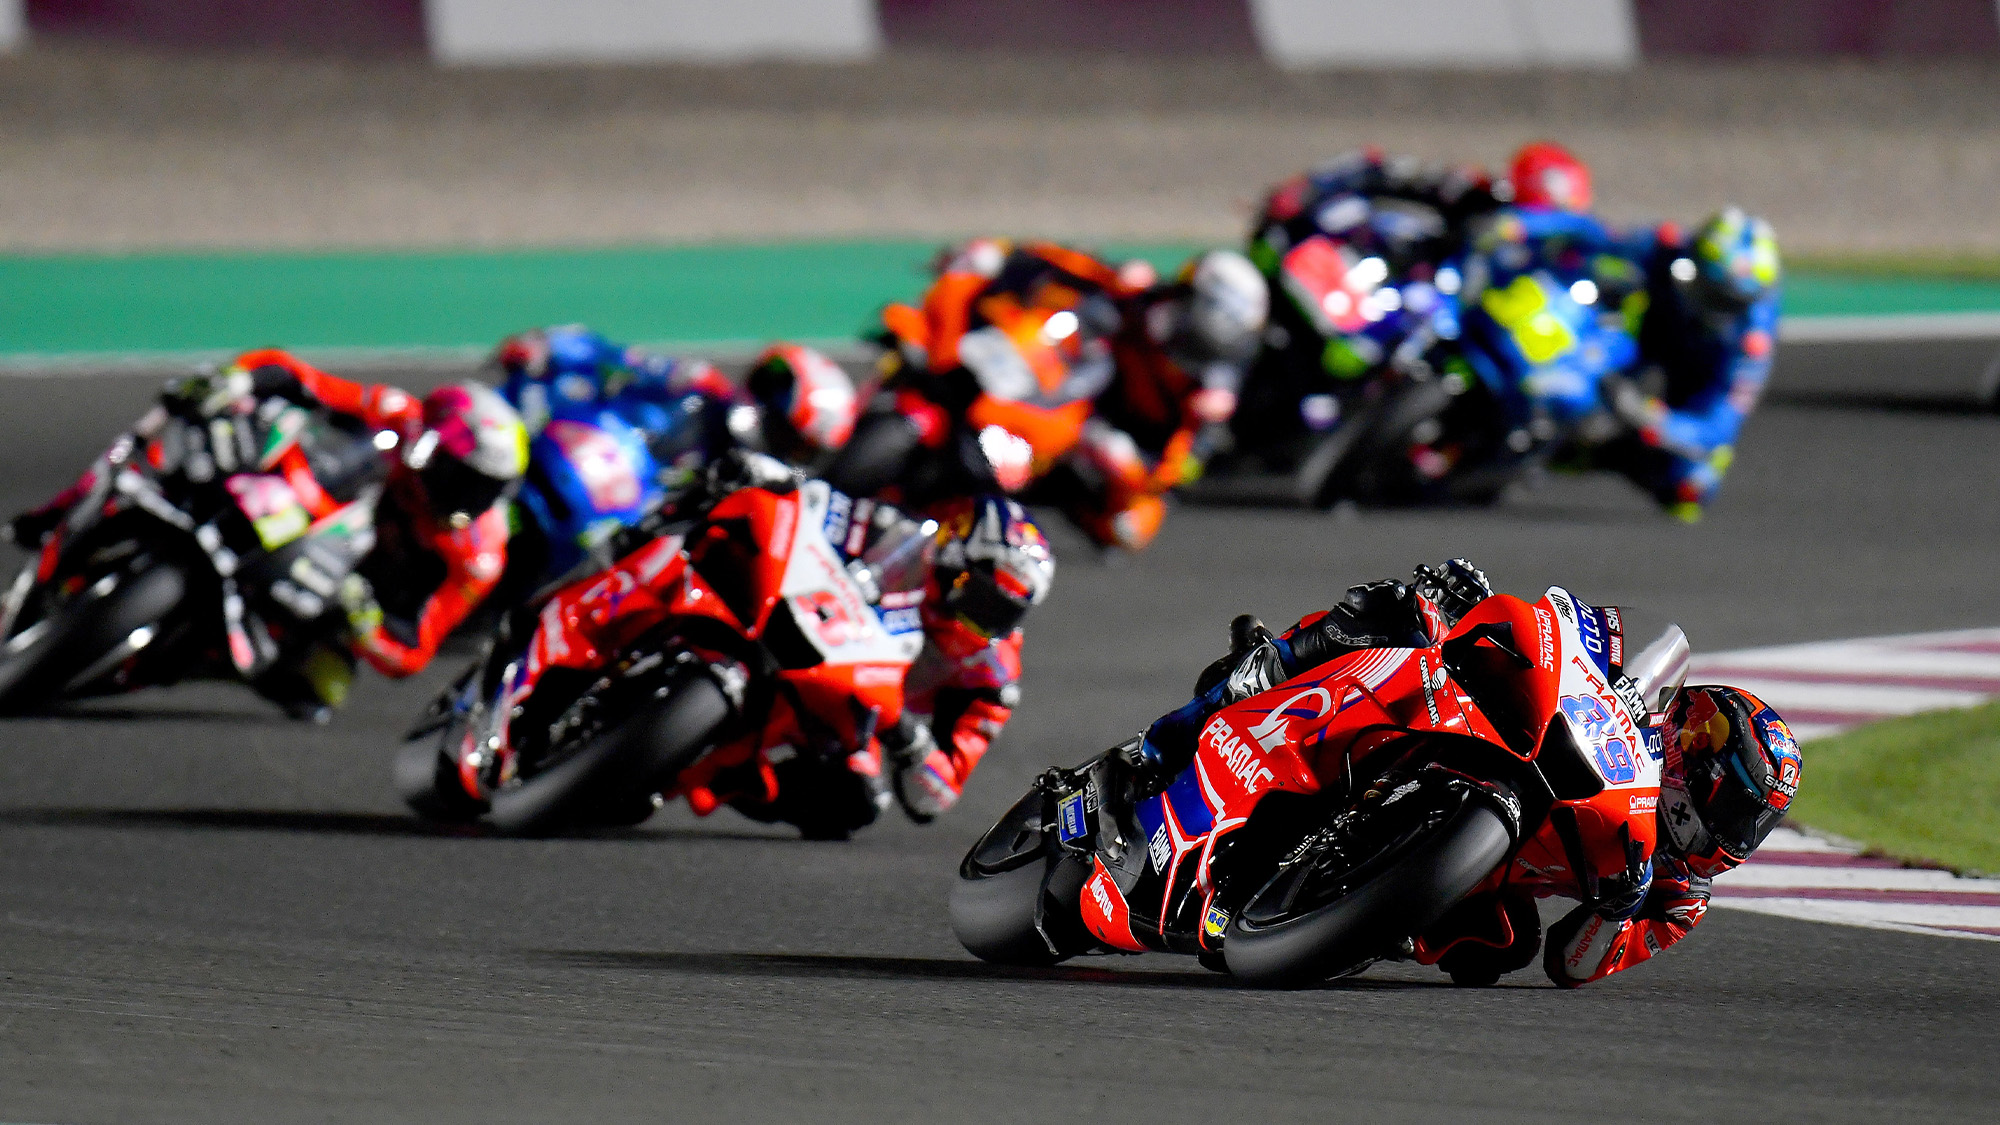 Jorge Martin leads in the 2021 MotoGP Doha race